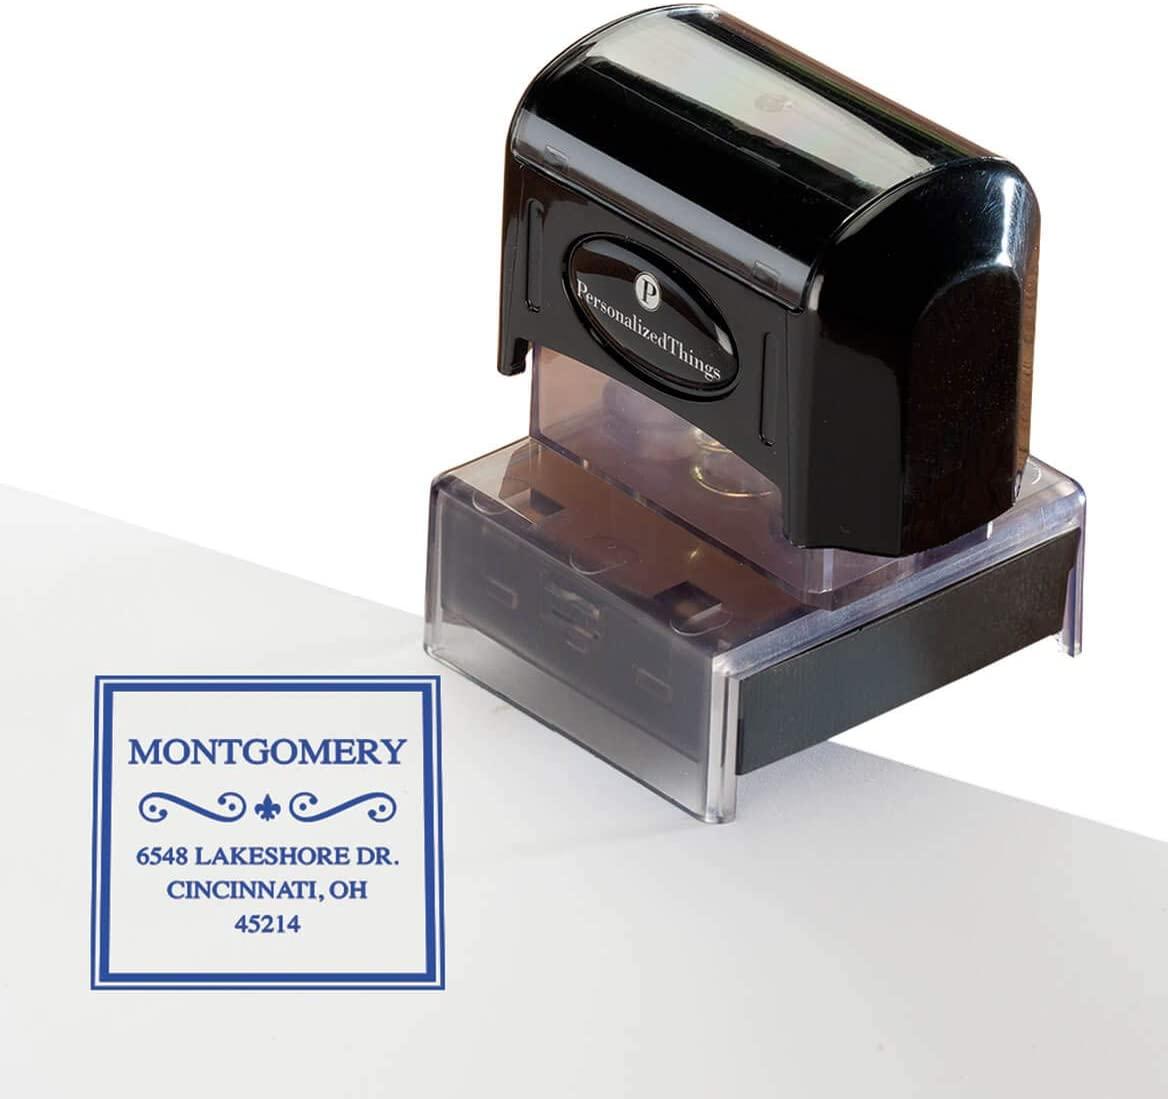 Personalized Address Stamper, Custom Return Address Self Inking Stamp Border Swirl Design, Blue - Wedding Invitation Stamp Thank You Card Stamp